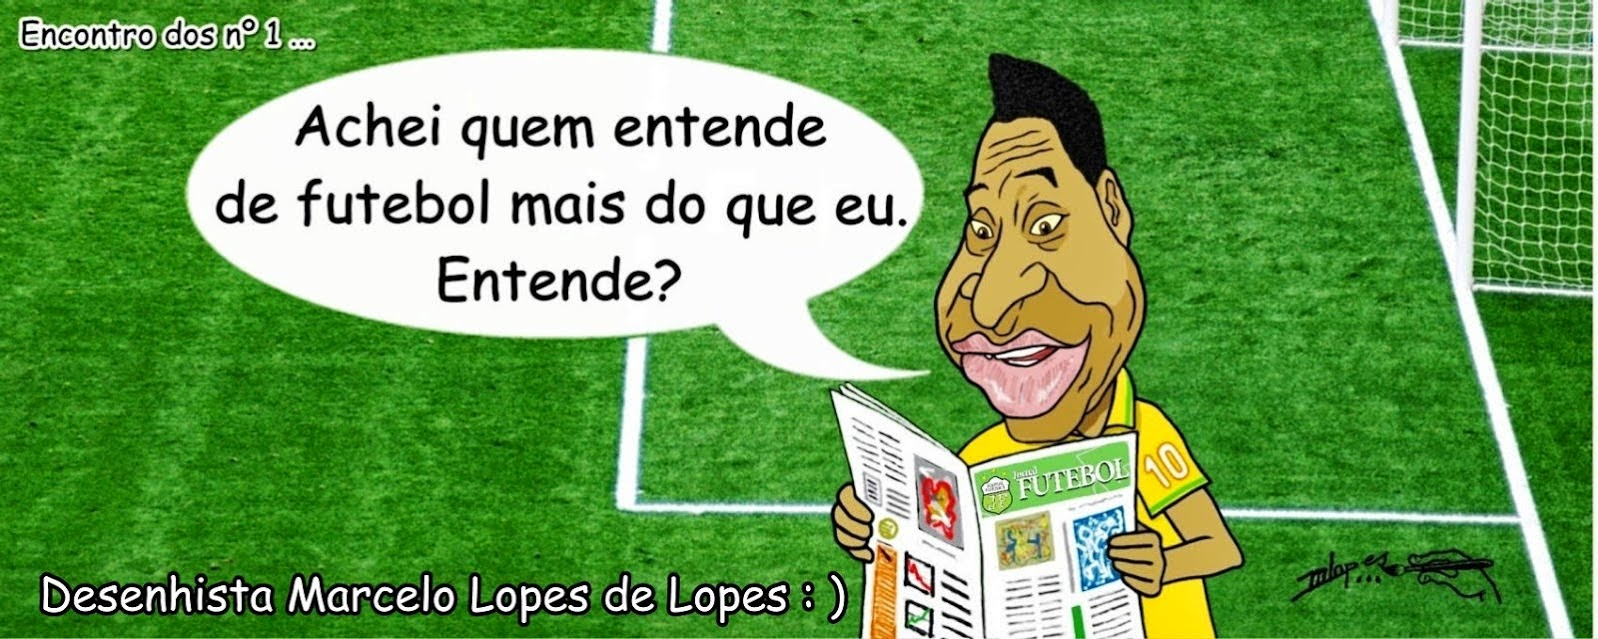 Caricatura de Pelé por Marcelo Lopes de Lopes